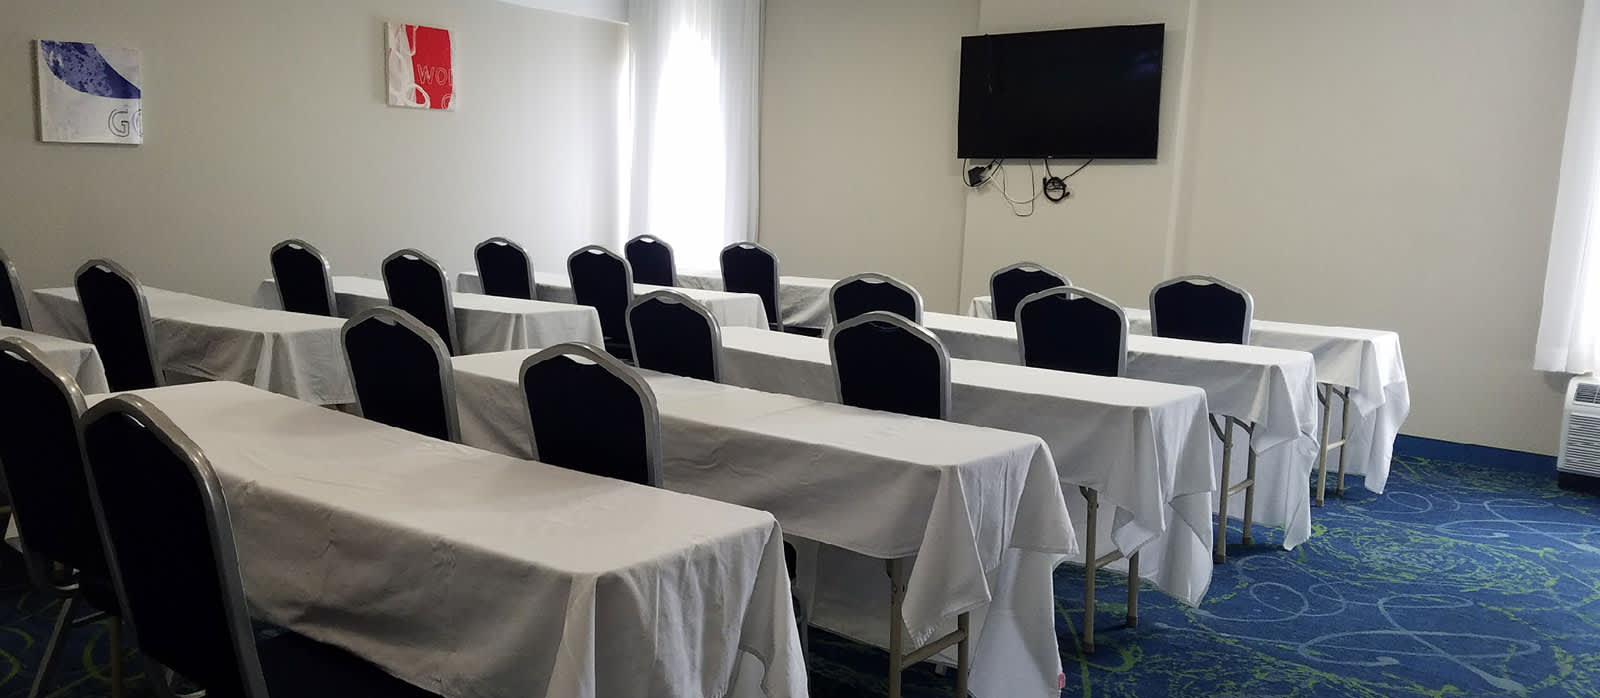 Meetings Facilities at Allentown Hotel, Pennsylvania